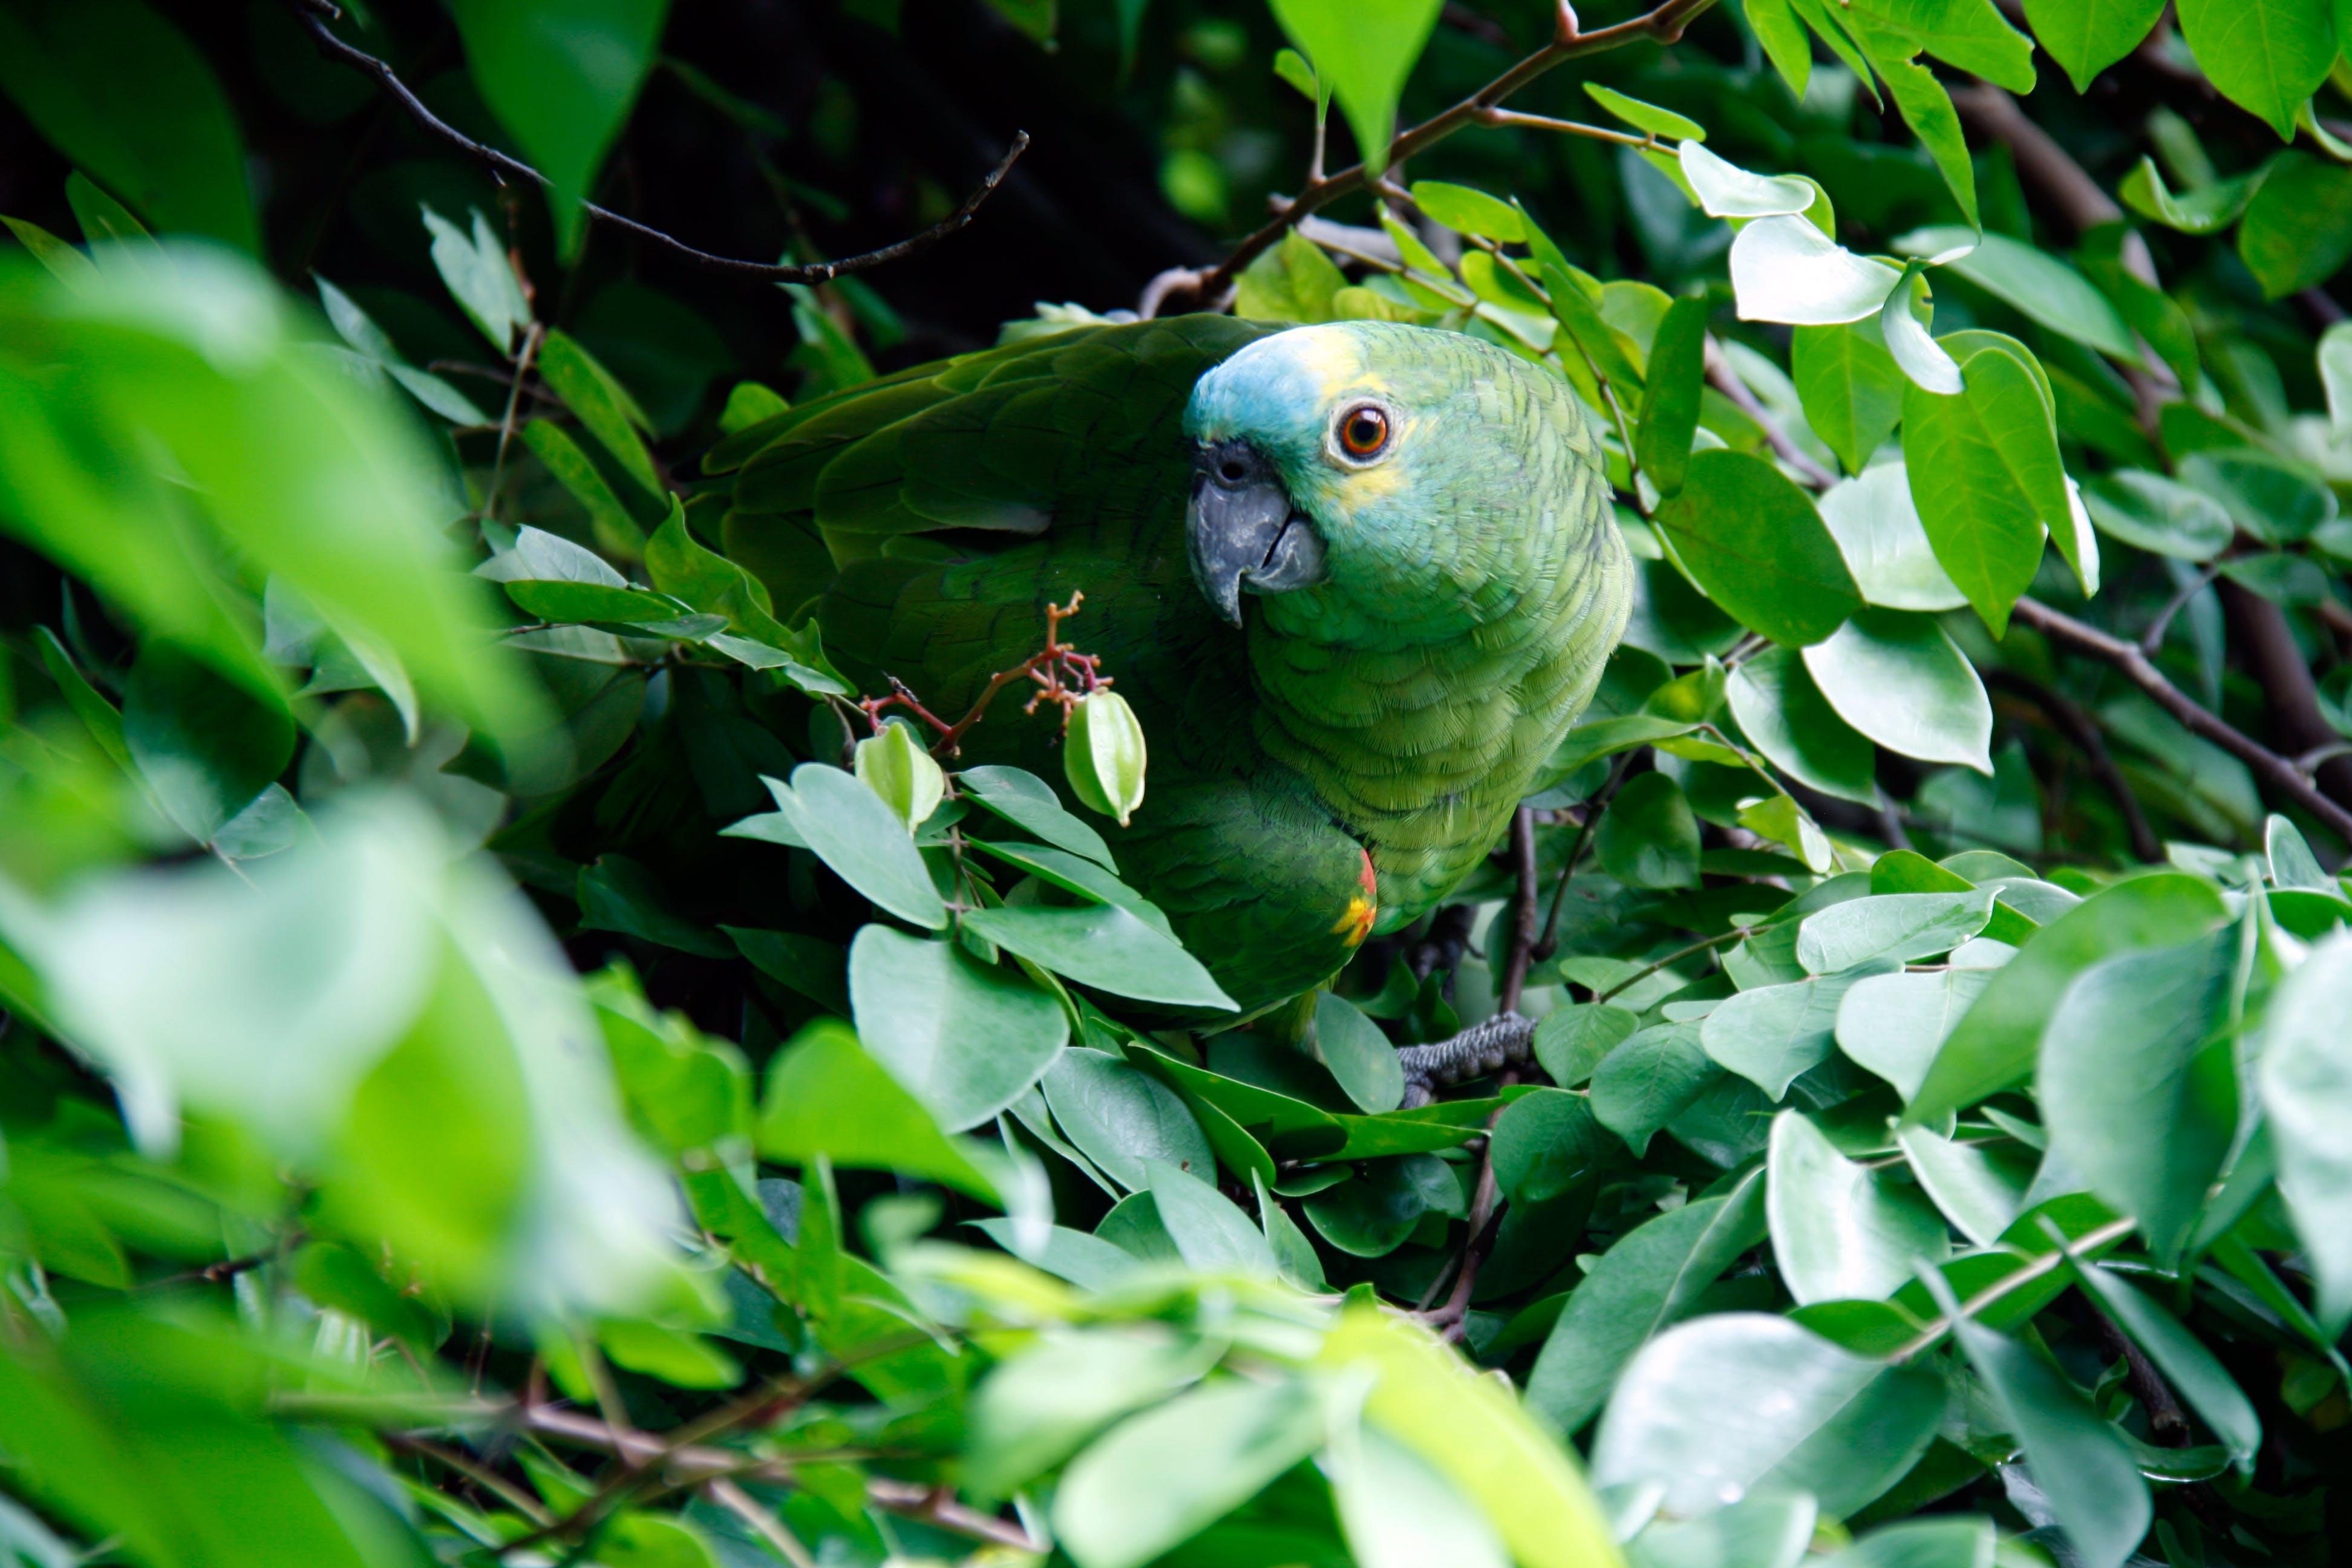 Red Parakeet on Green Leaf Plant